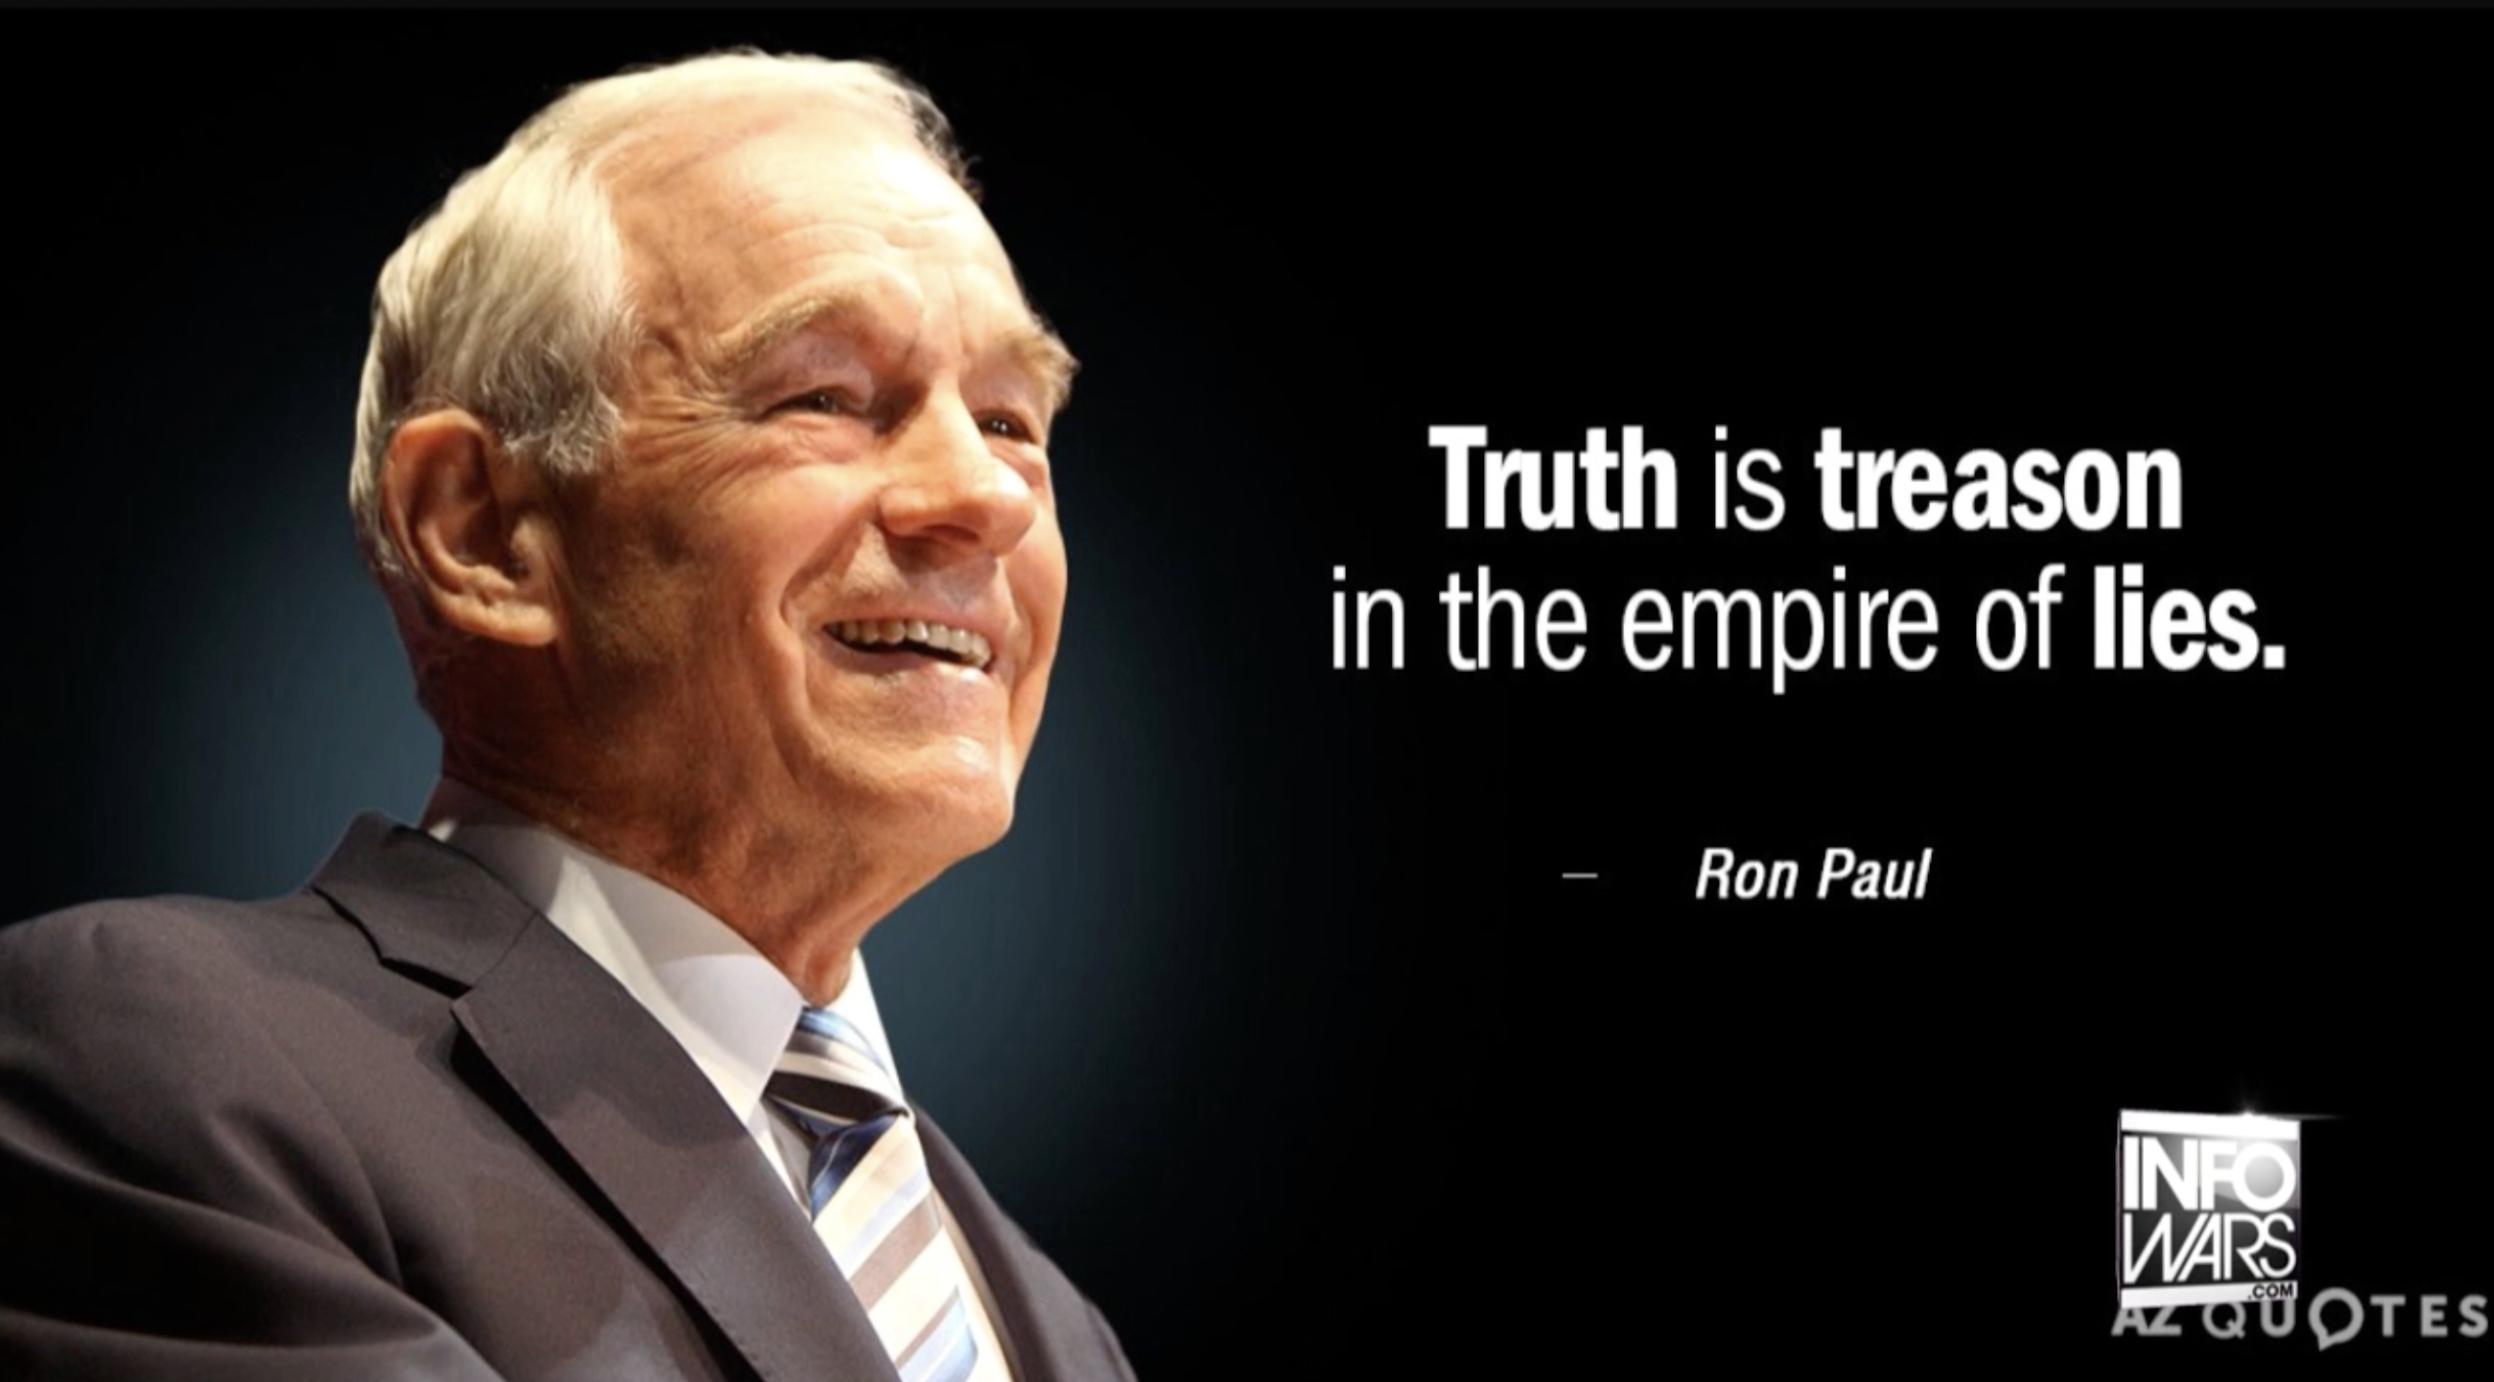 Ron Paul 1 27 2020